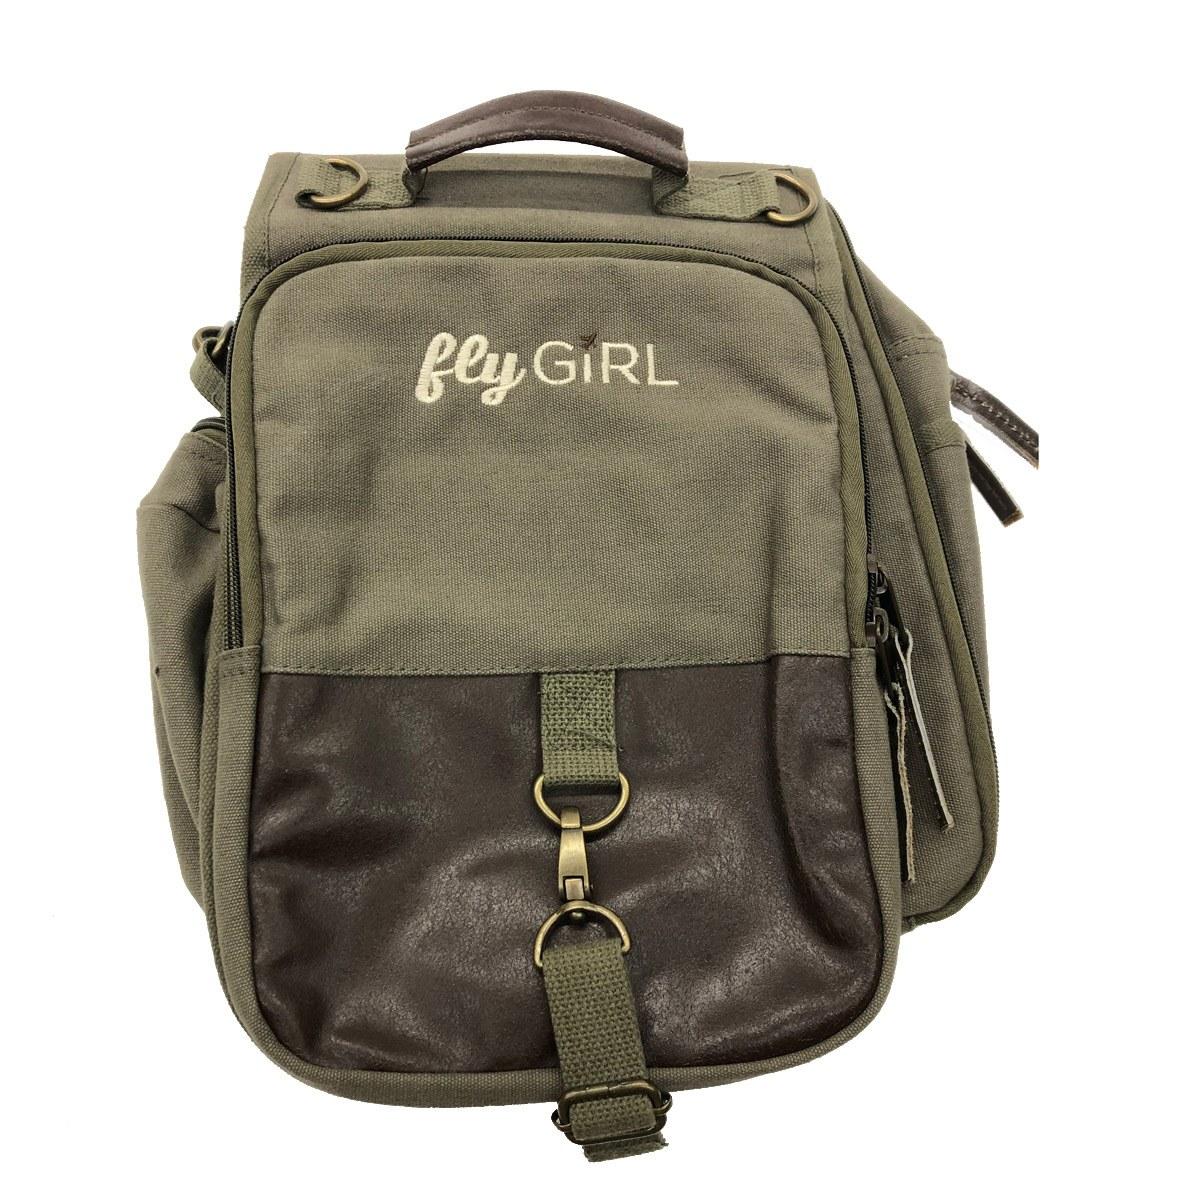 flyGirl Bag